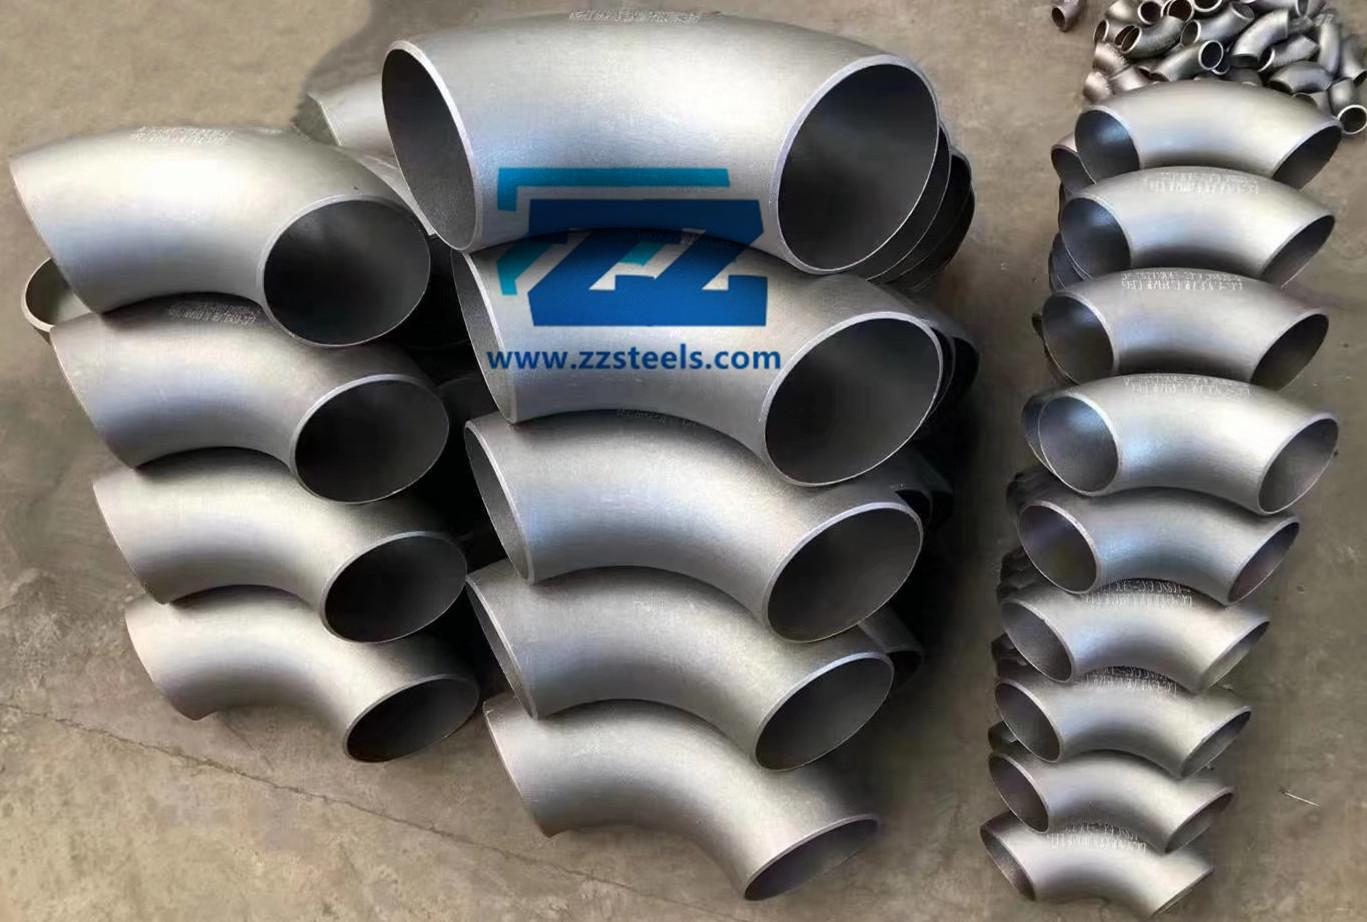 Stainless Steel Buttweld Fittings Manufacturer Zizi